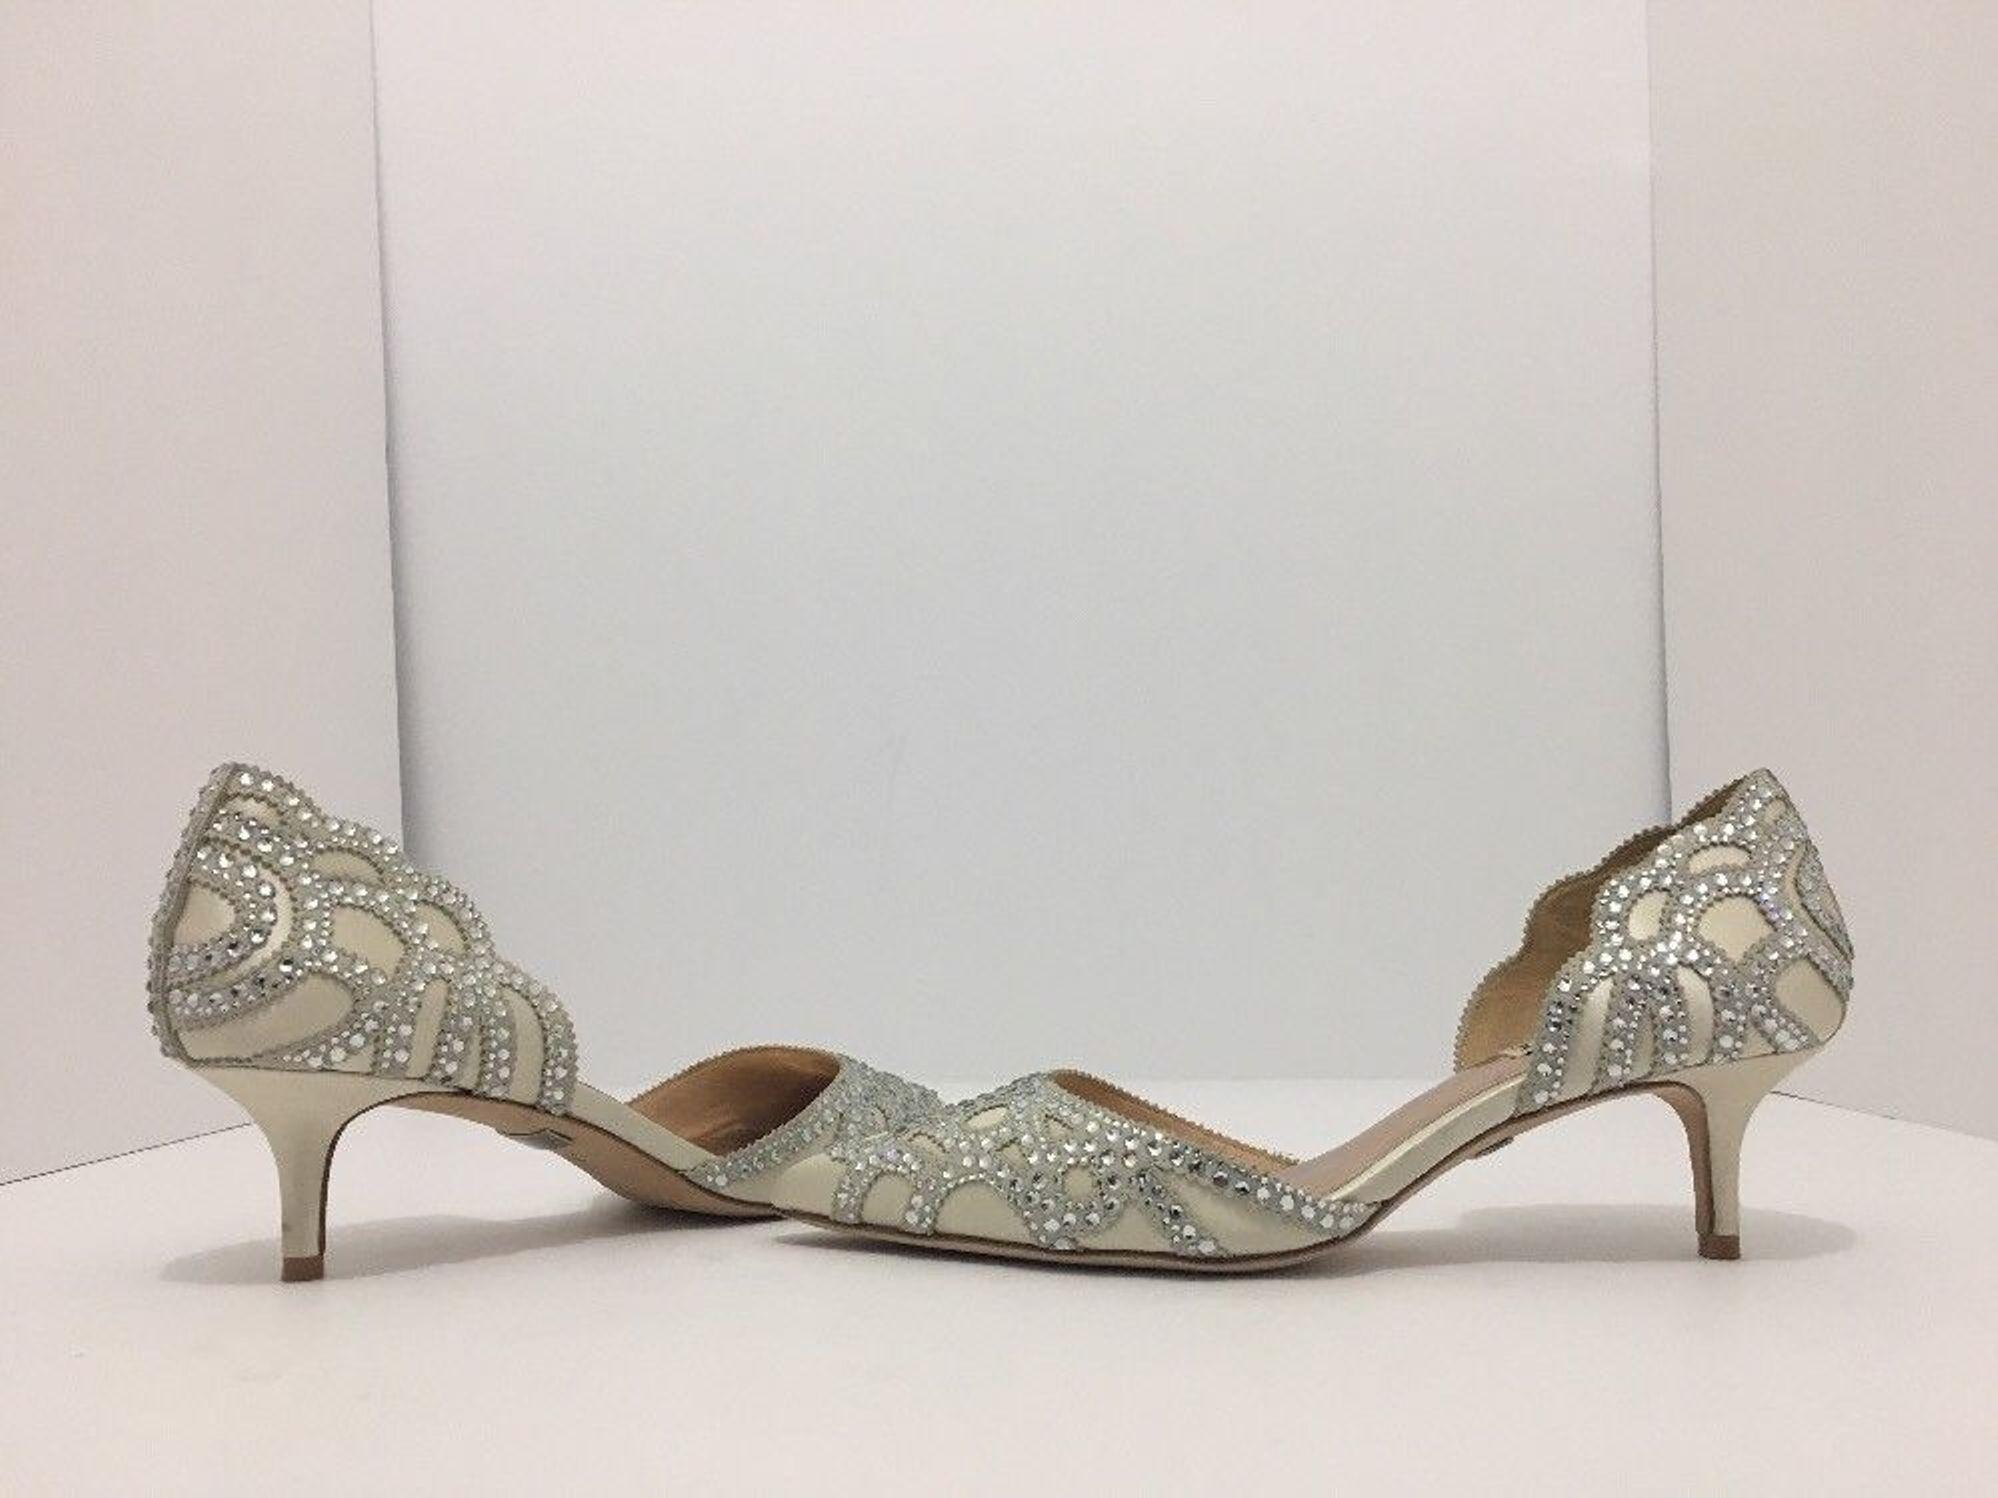 bf40dff4f Badgley Mischka Gaby Ivory Satin Chiffon Women s Dressy Evening Heels  Sandal 6.5  BadgleyMischka  FashionDressyEveningHeels…